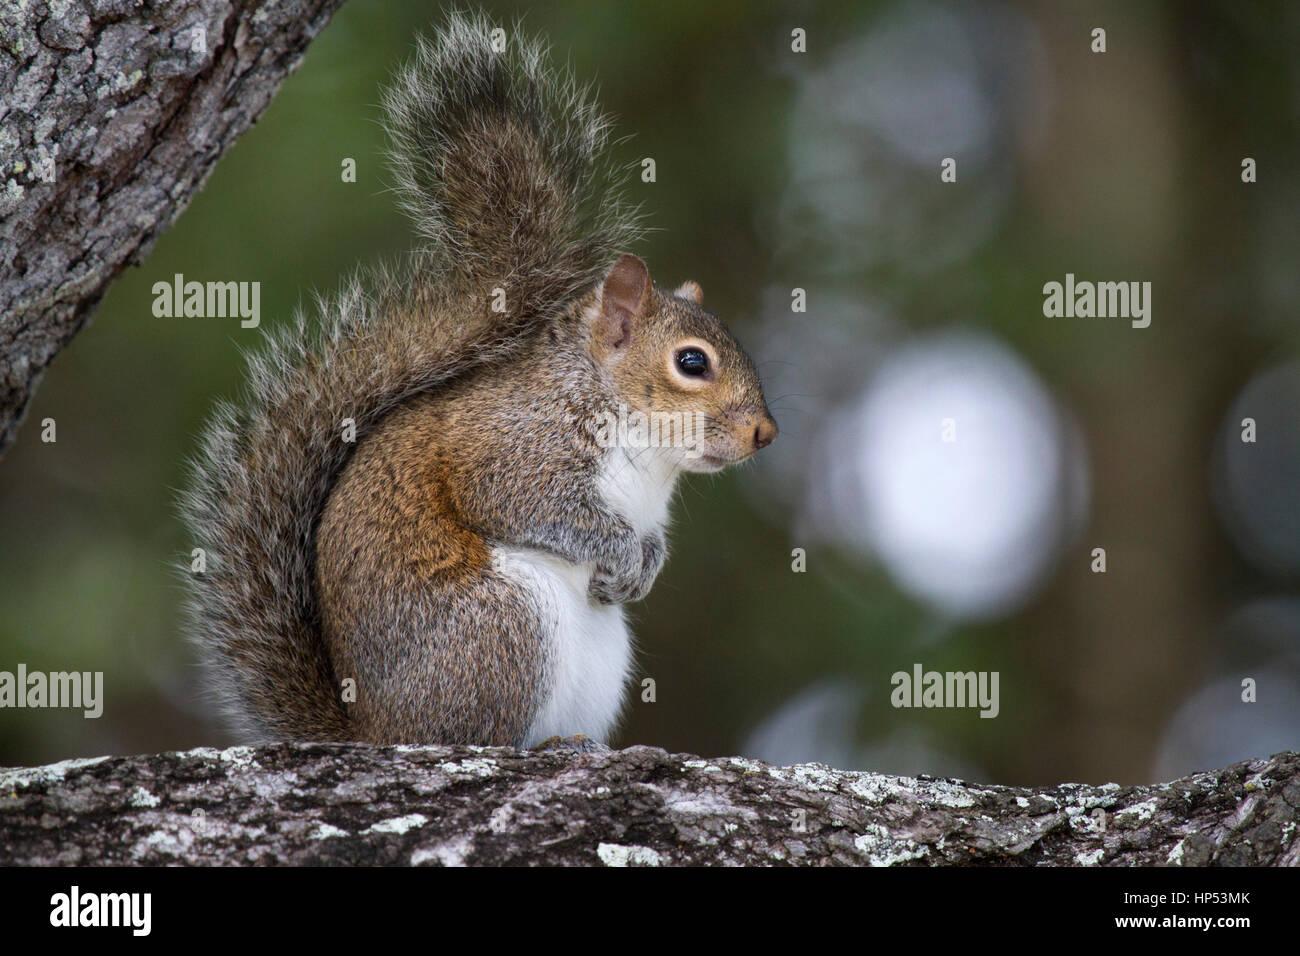 Eastern grey squirrel in Florida - Stock Image